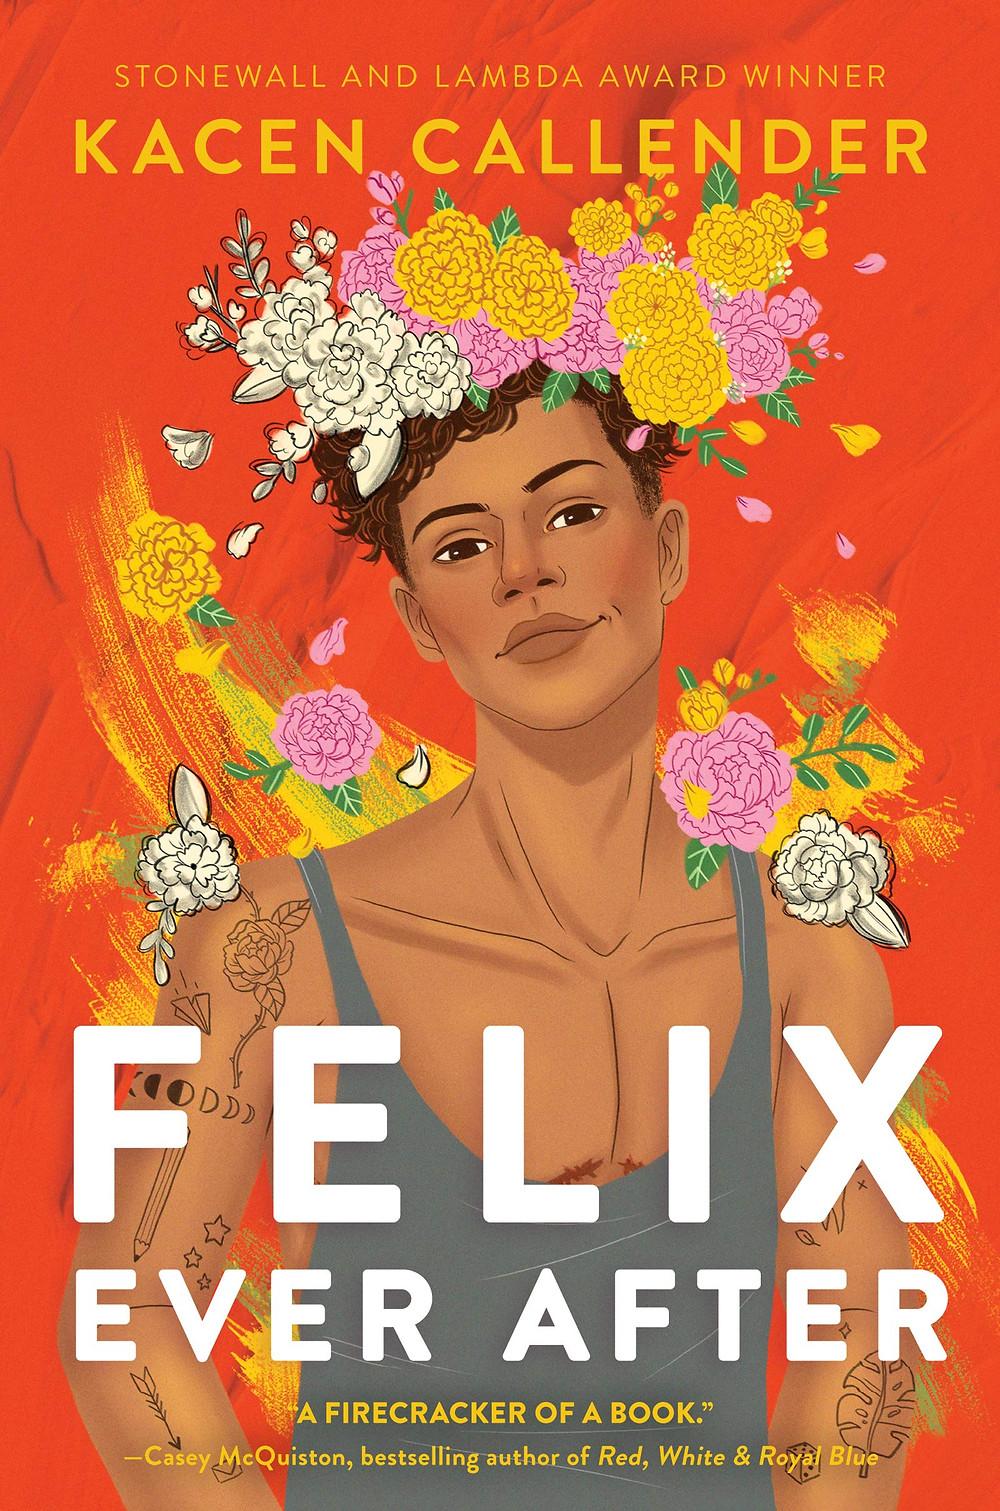 Book cover of Felix Ever After by Kacen Callender.